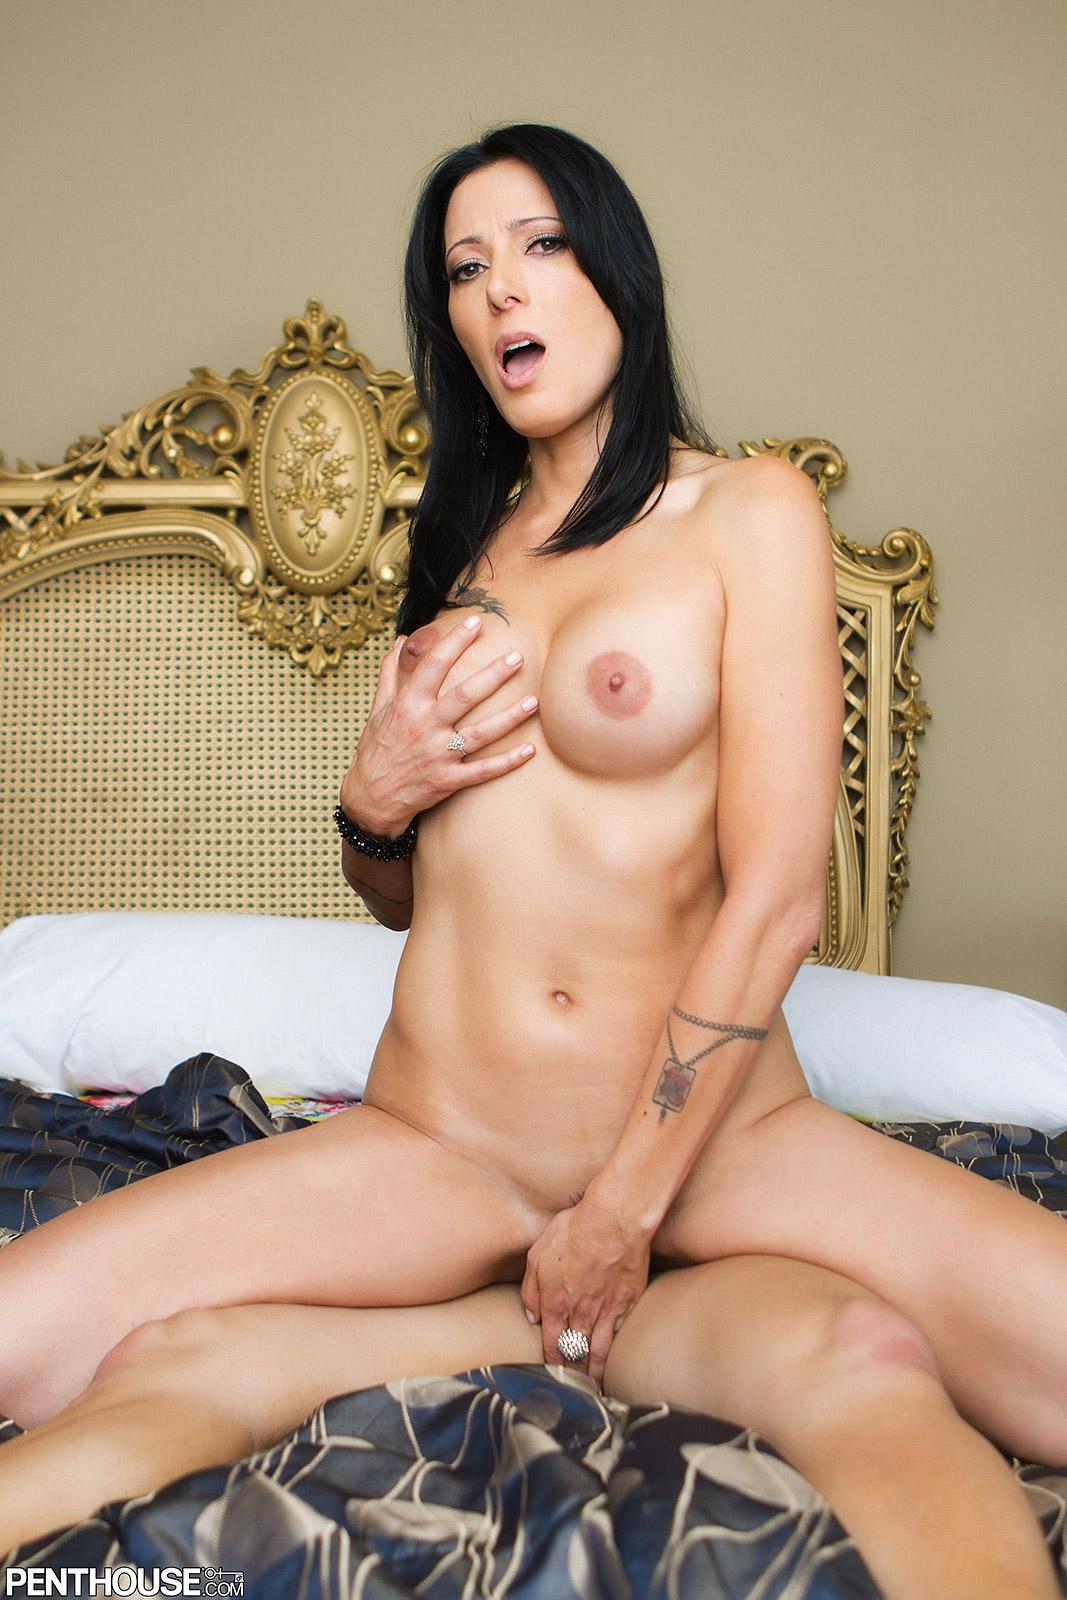 Zoey Holloway Bio